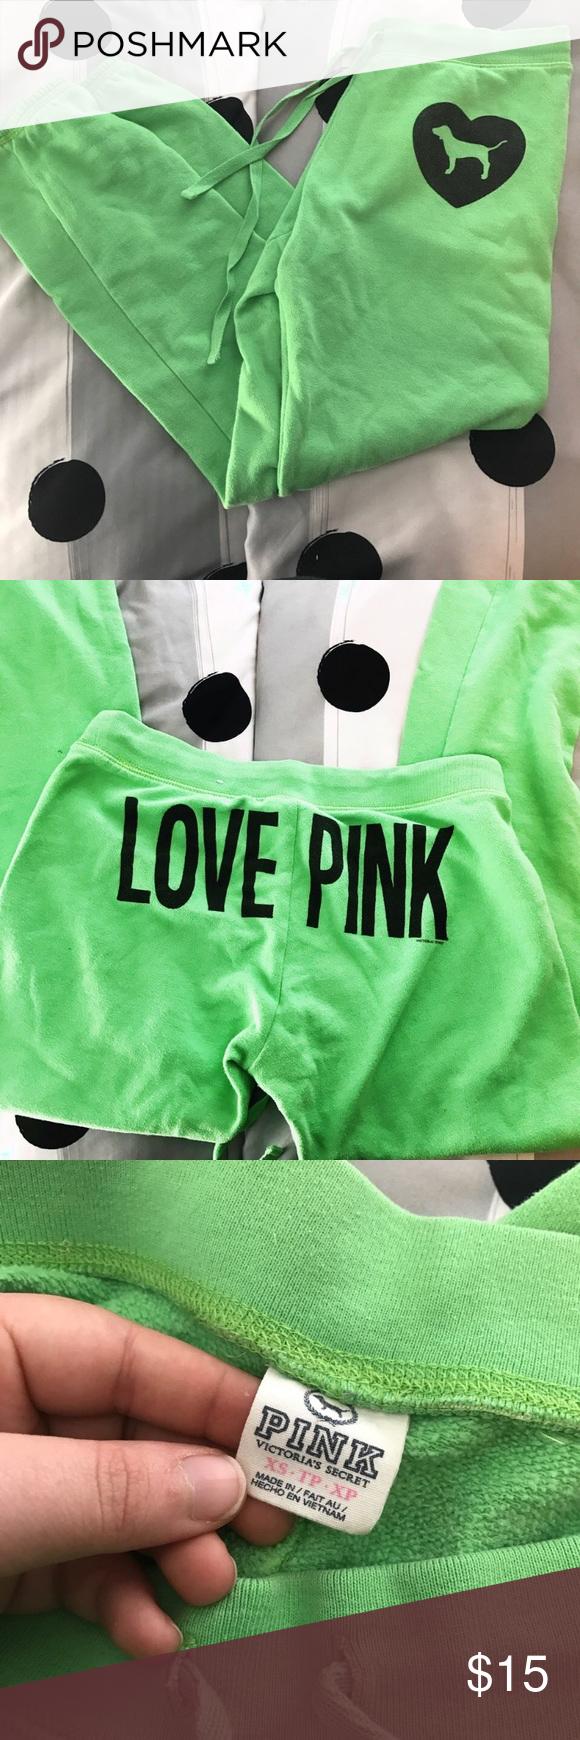 GREEN VS LOVE PINK CAPRI SWEATPANTS Capri sweatpants from Victoria's secret Love Pink PINK Victoria's Secret Pants Capris